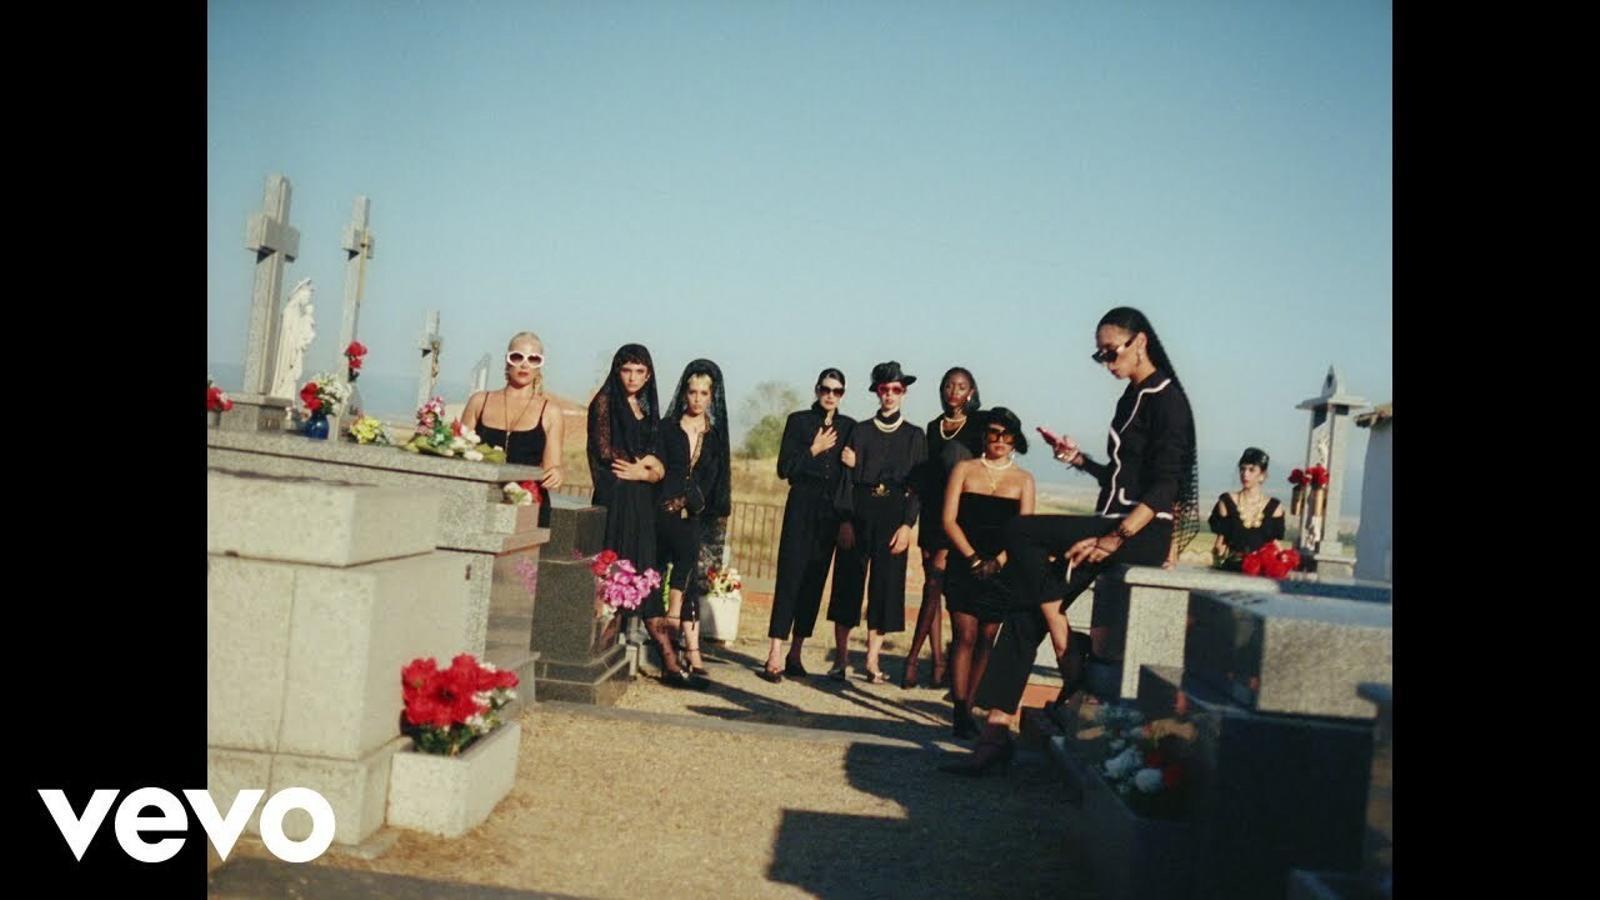 C. Tangana, 'Demasiadas mujeres', videoclip